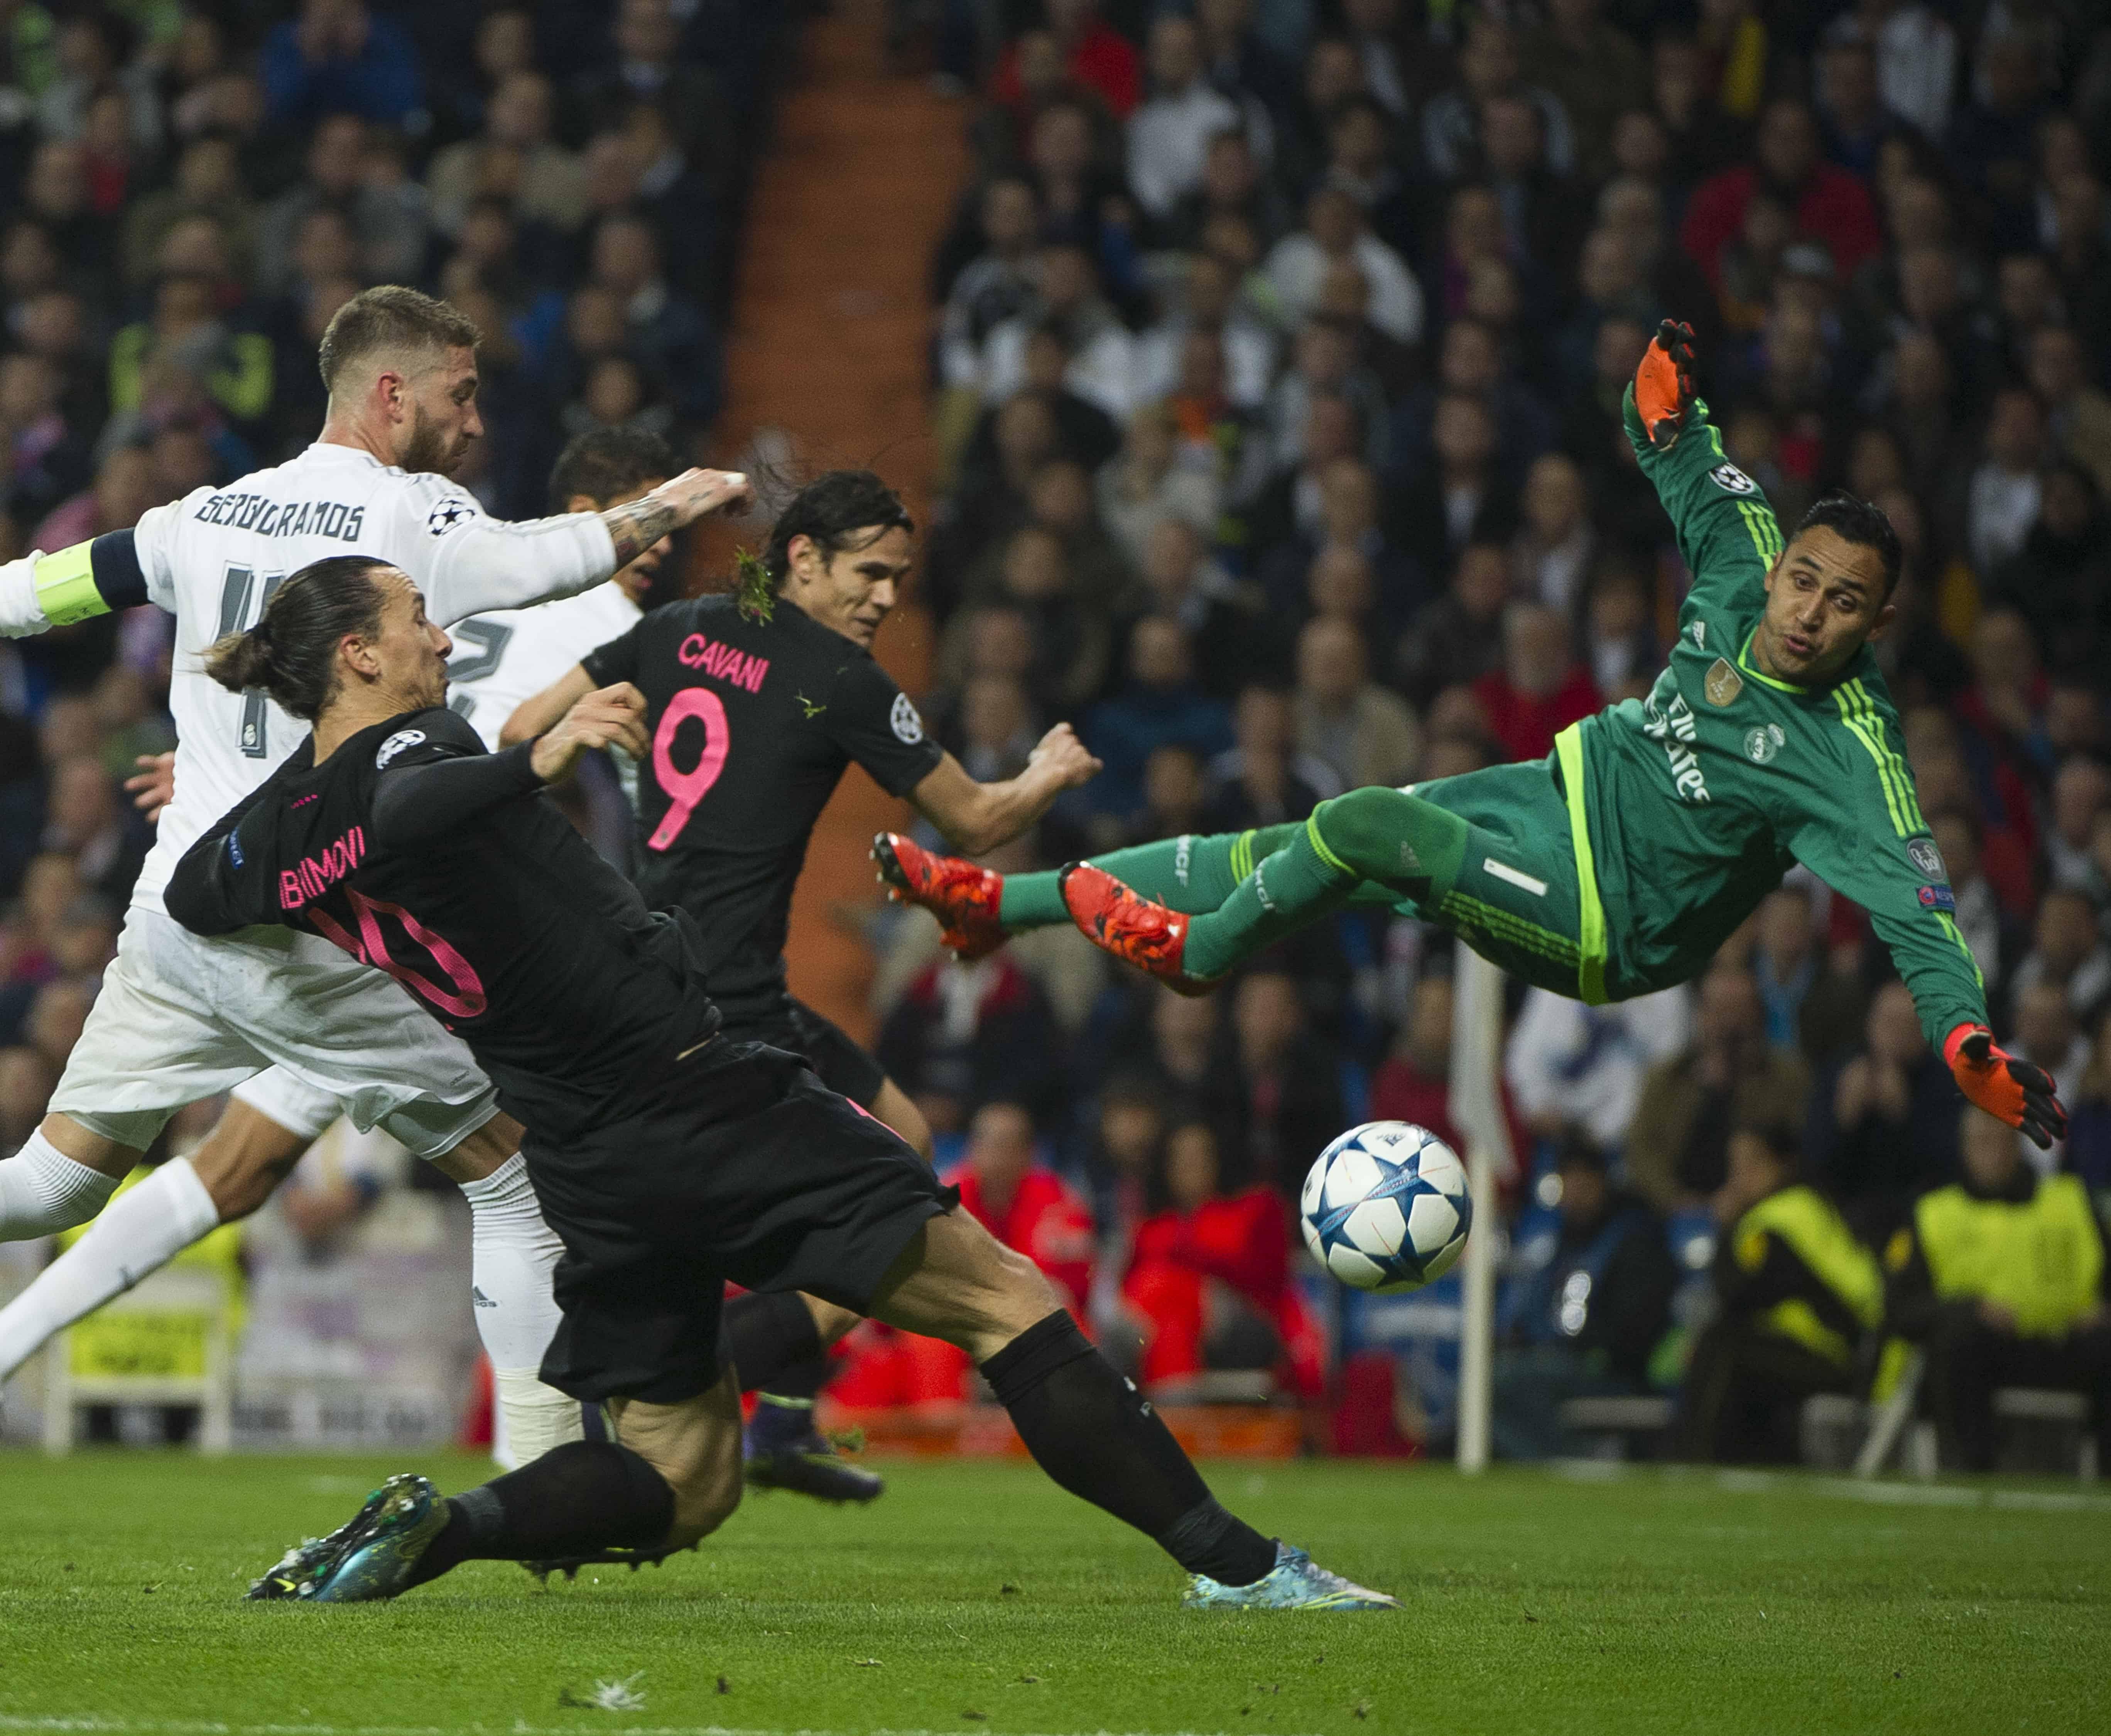 Keylor Navas vs PSG